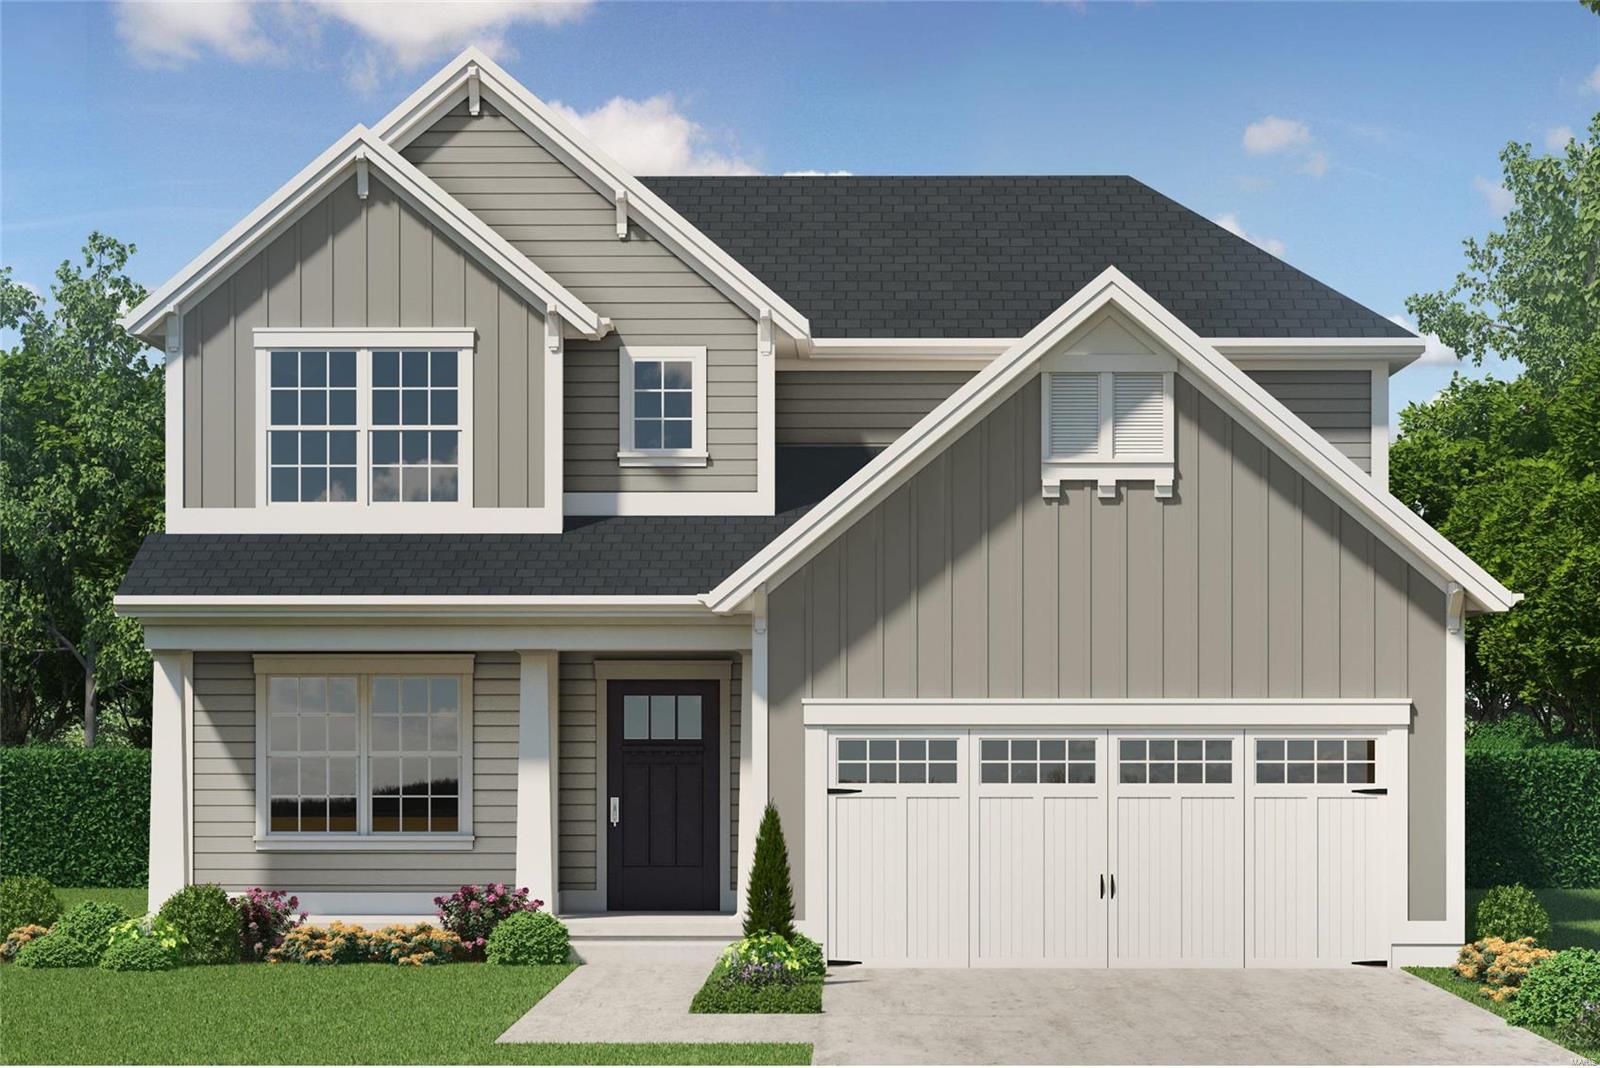 533 S Fillmore TBB Avenue Property Photo - Kirkwood, MO real estate listing